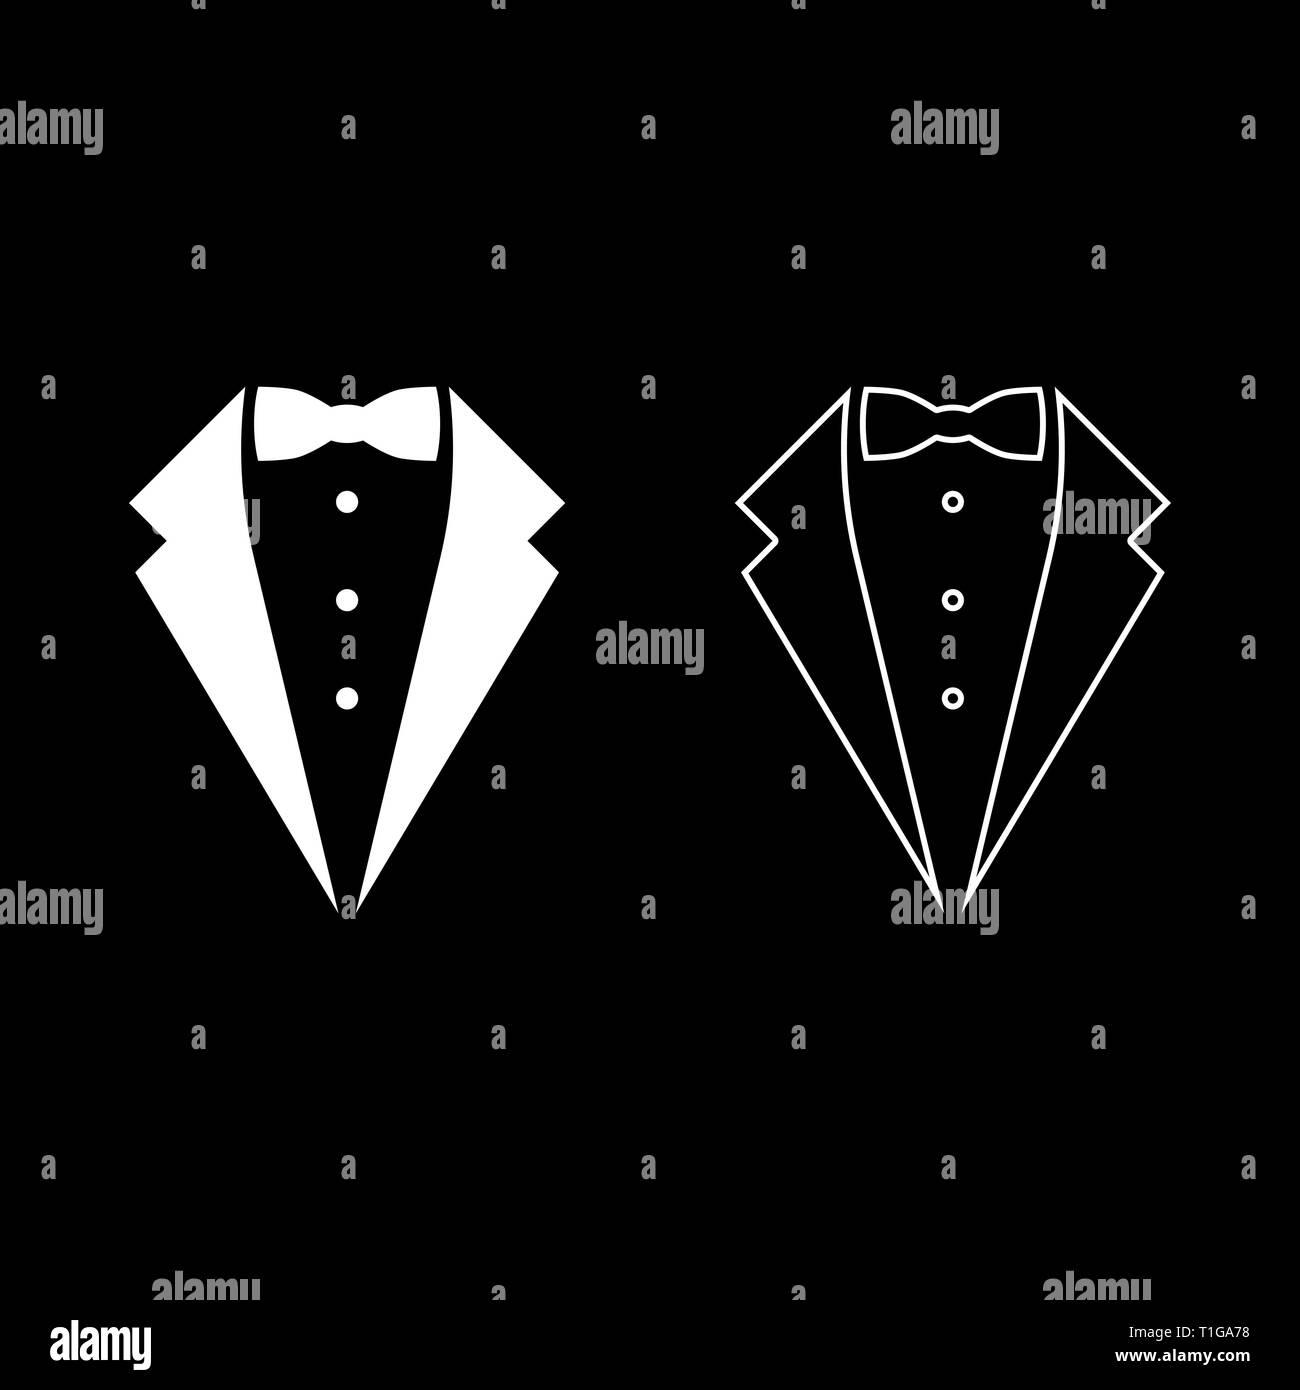 Symbol service dinner jacket bow Tuxedo concept Tux sign Butler gentleman idea Waiter suit icon set white color vector illustration flat style simple - Stock Image